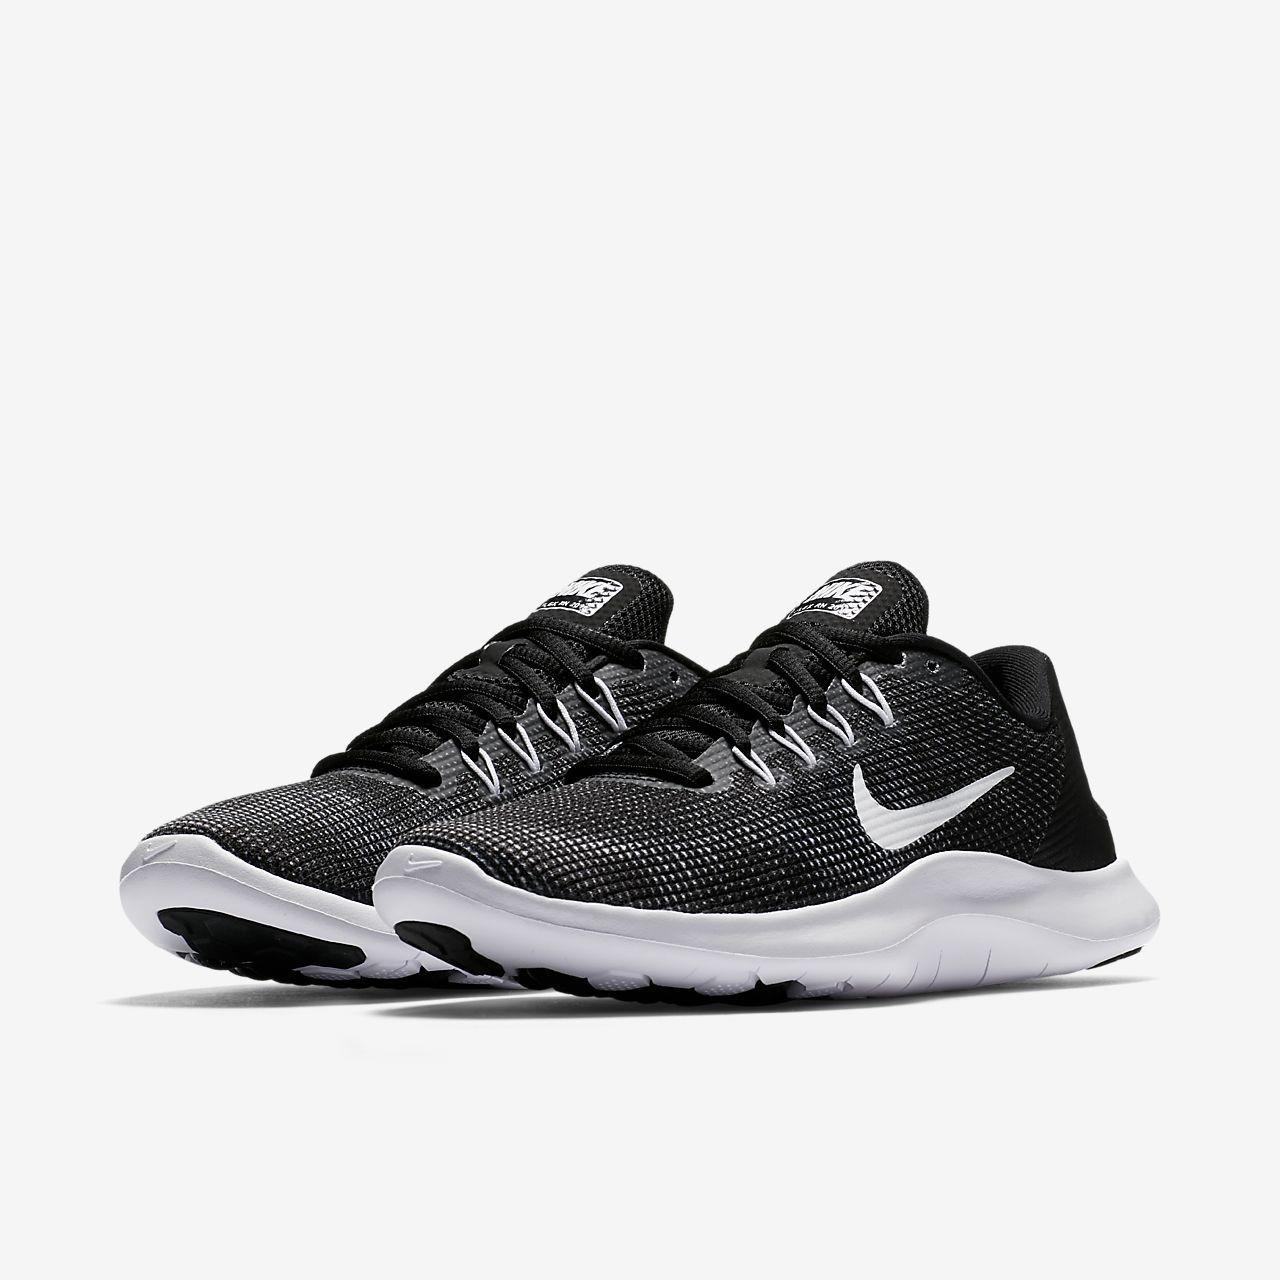 timeless design 69b18 55c7f ... Nike Flex RN 2018 Hardloopschoen voor dames